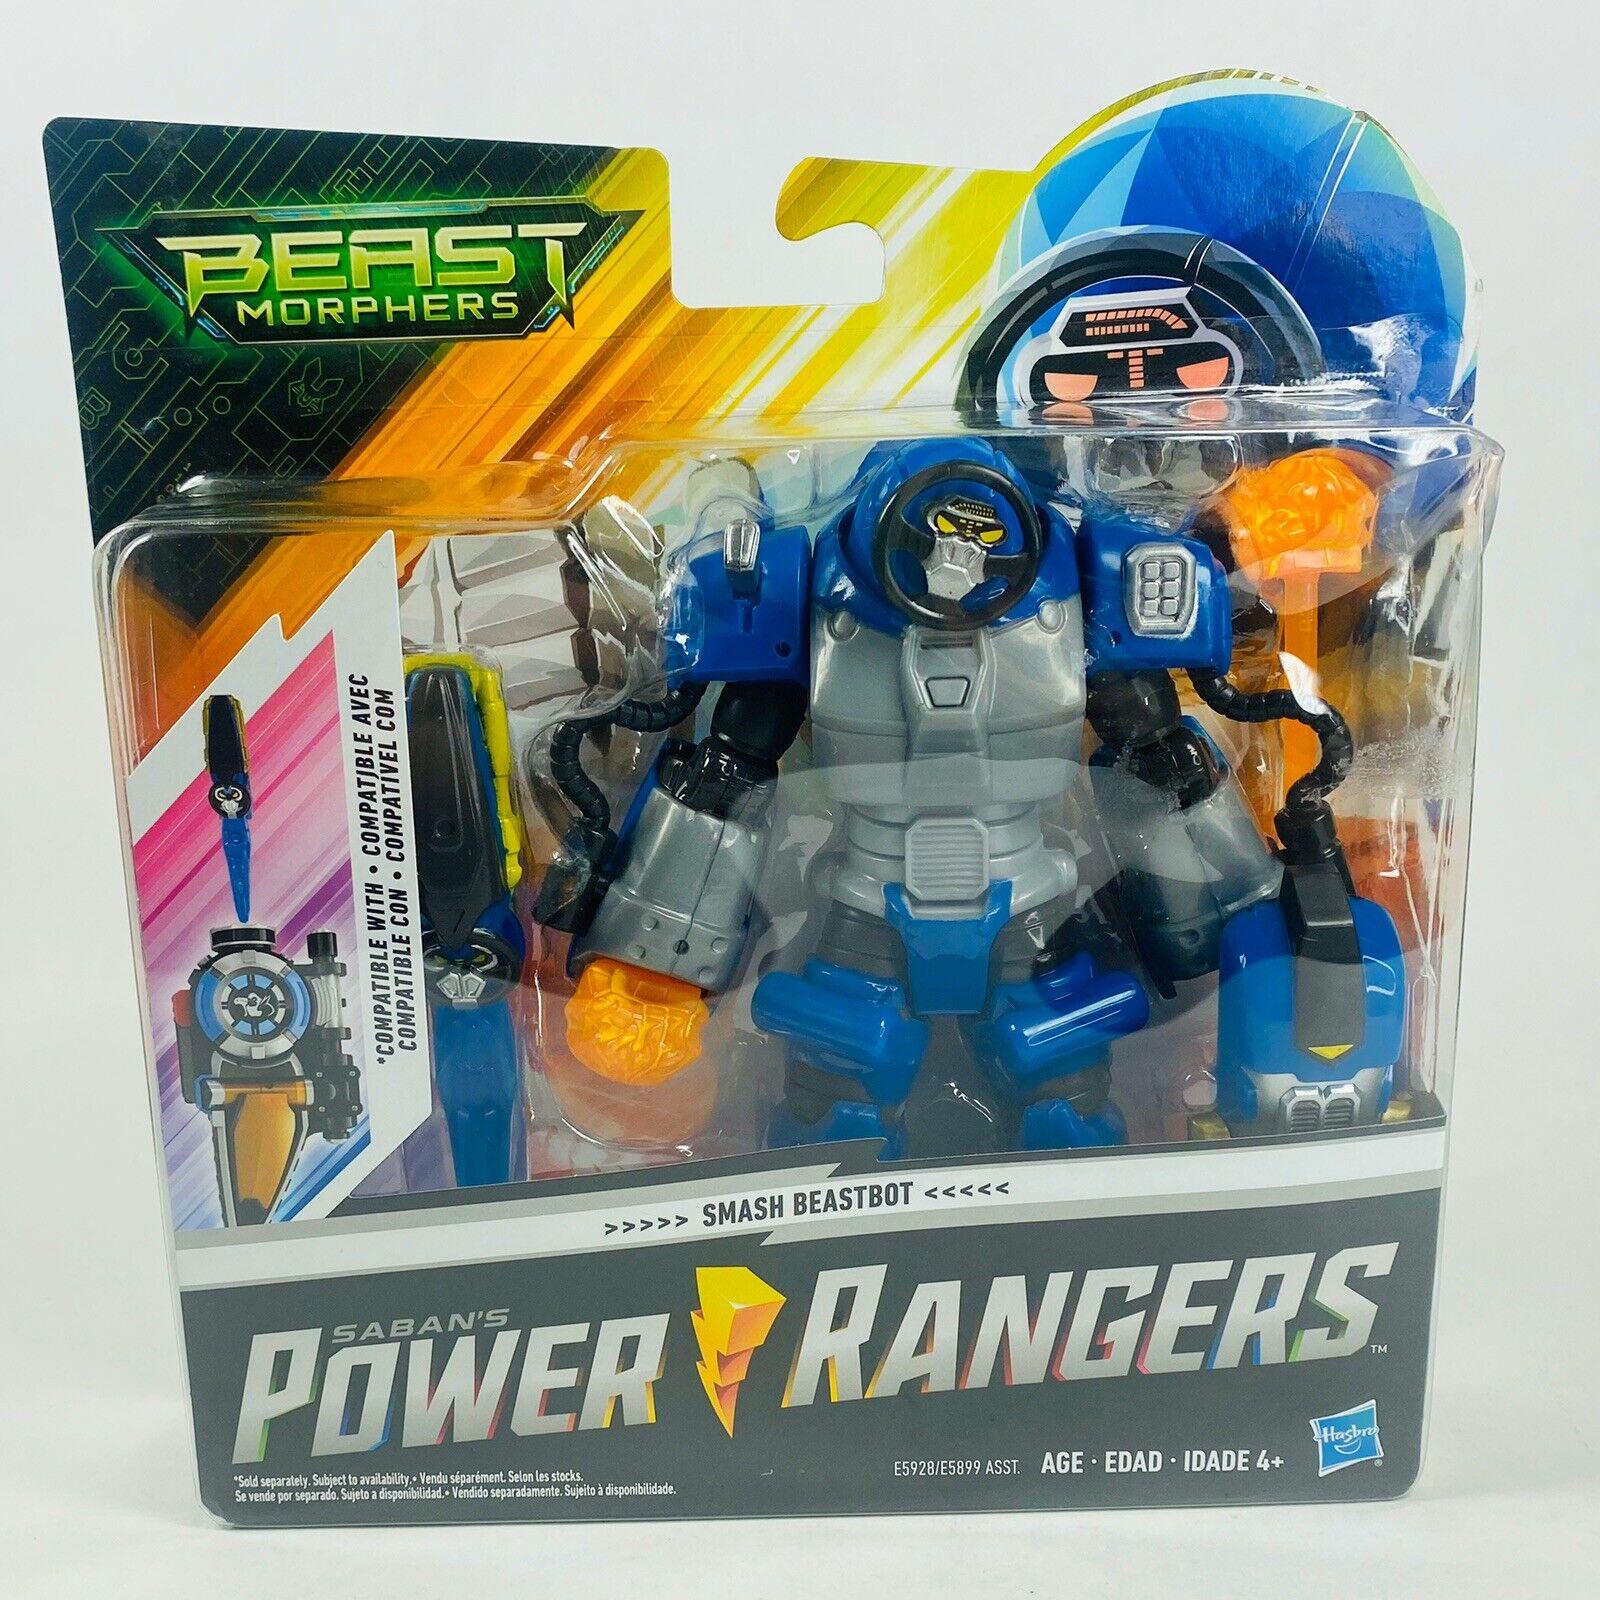 New in Box HASBRO POWER RANGERS Bête Morphers Jack beastbot Action Figure Brand New!